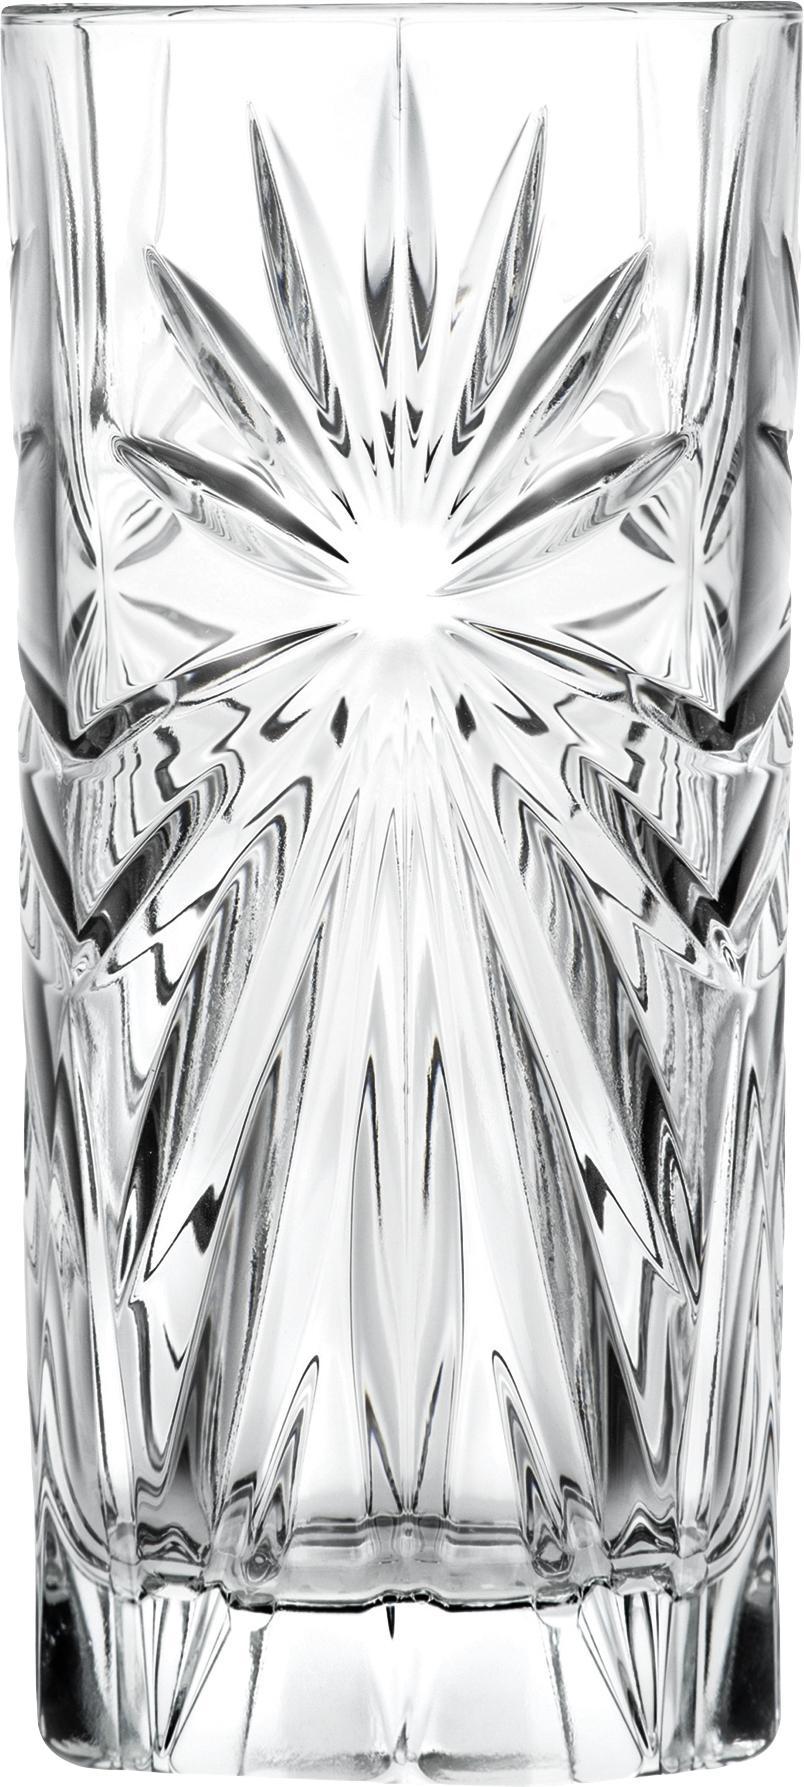 Bicchiere long drink in cristallo Bichiera 4 pz, LUXION® cristallo, Trasparente, Ø 7 x Alt. 15 cm